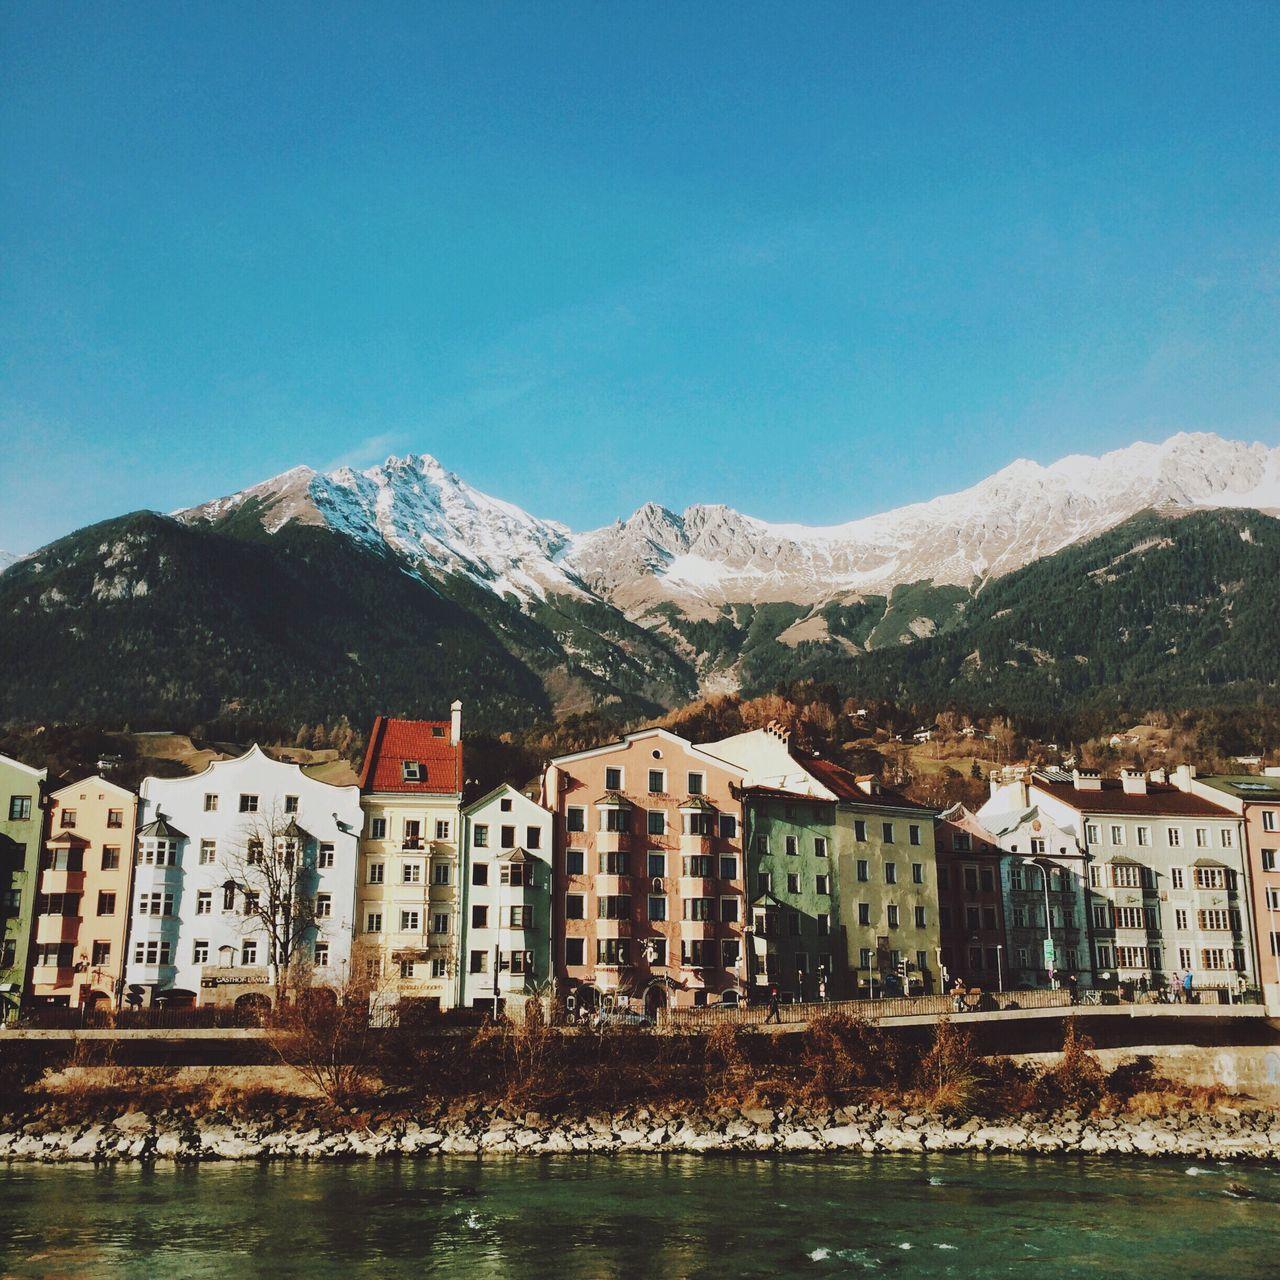 Innsbruck. Innsbruck Austria My Winter Favorites IPhoneography Showcase: December The Week Of Eyeem Eye4photography  Alpen EyeEm Best Shots Mountains And Sky Alps Enjoying The View